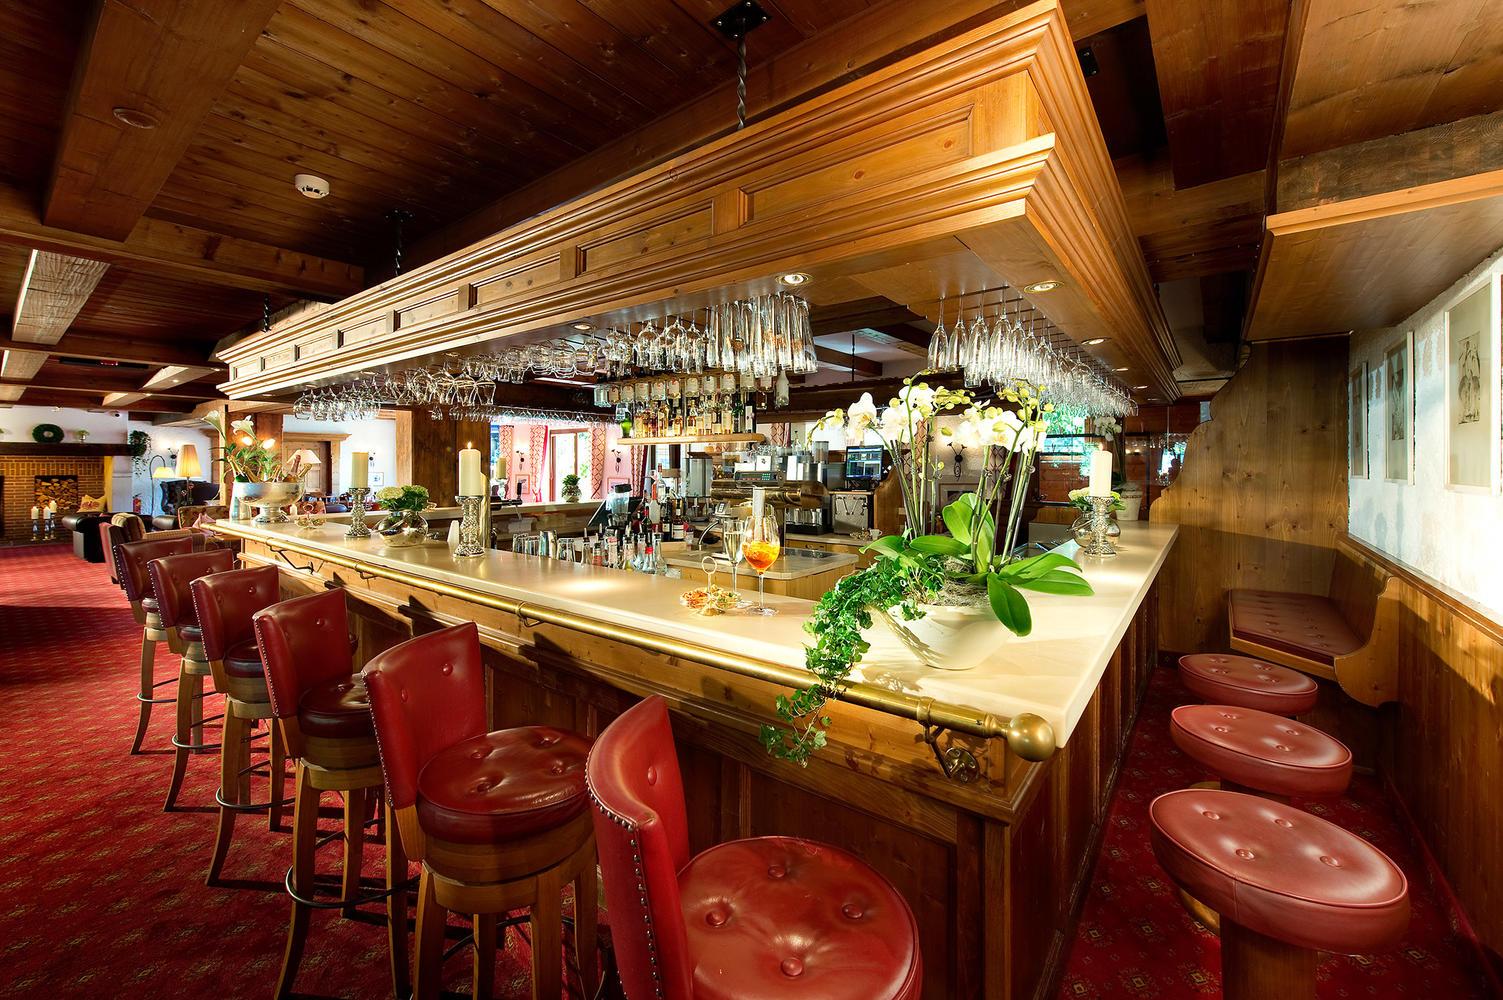 Romantik Hotel Boglerhof Alpbach Austria UPDATED 2017 OFFICIAL